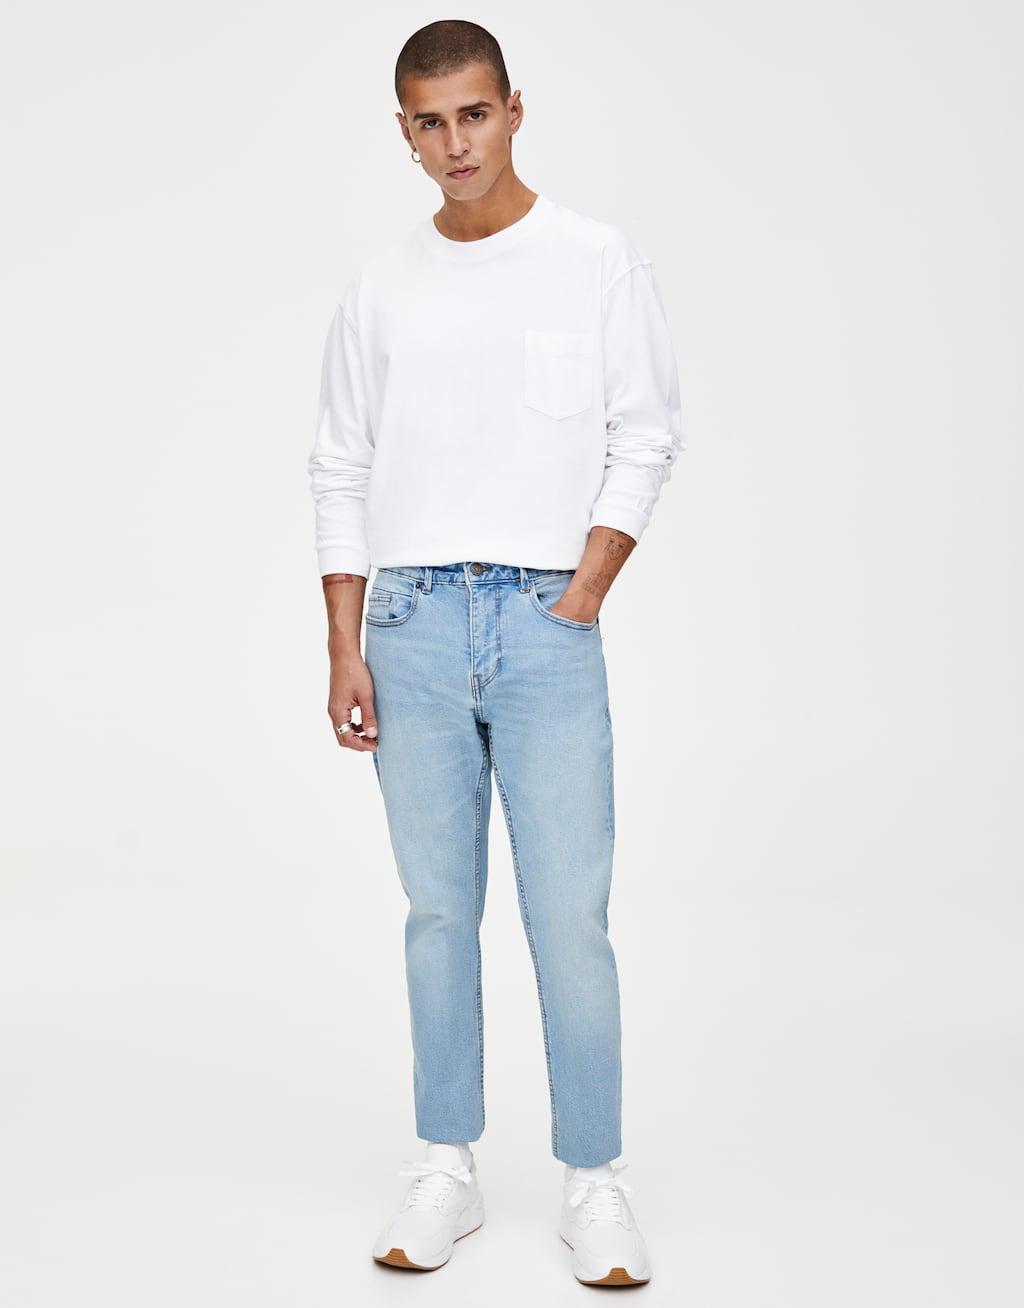 Jeans Slim Conforto Fit Em Azul Médio by Pull & Bear